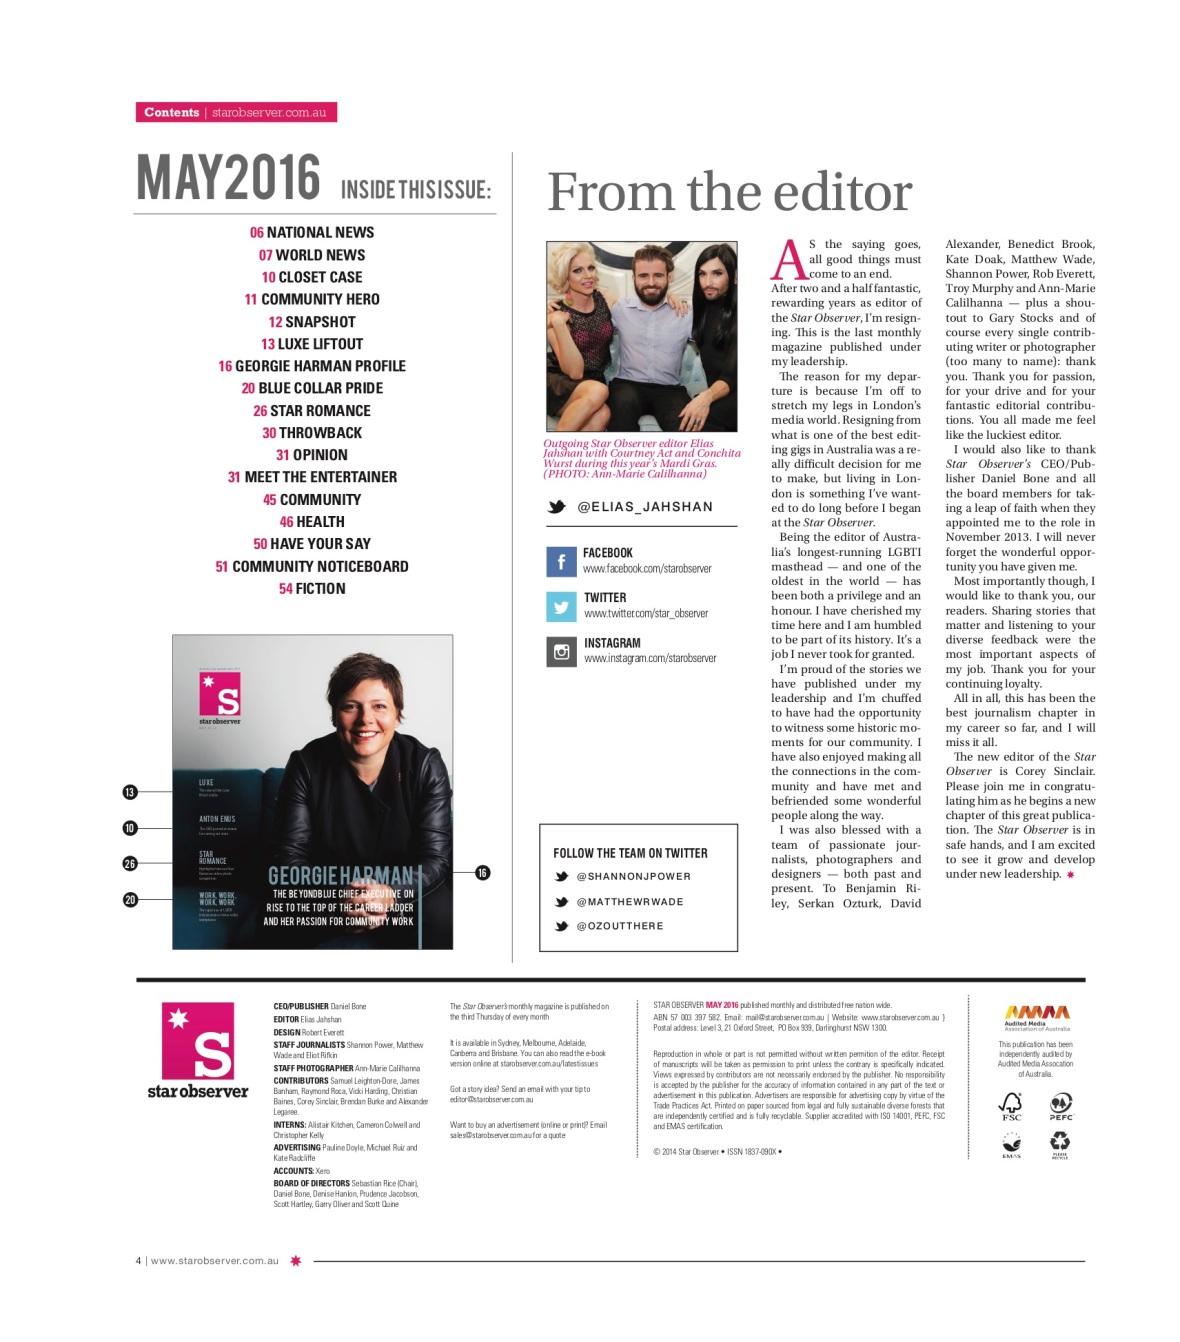 Karen From Finance Star Observer Magazine _ May 2016 index